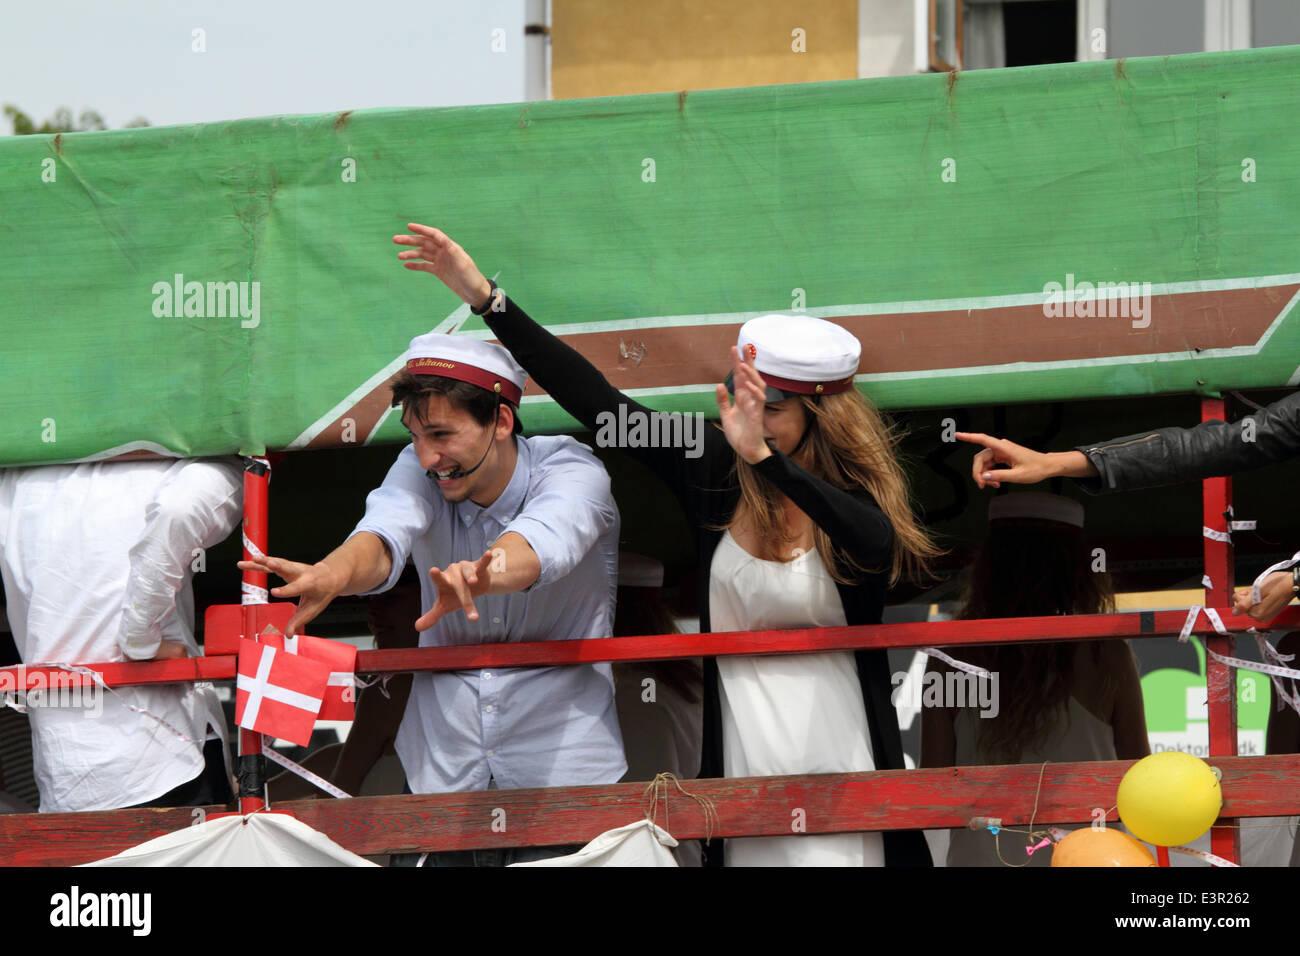 Hørsholm / Hoersholm, north of Copenhagen, Denmark. June 27, 2014. Danish students in white student caps celebrate - Stock Image